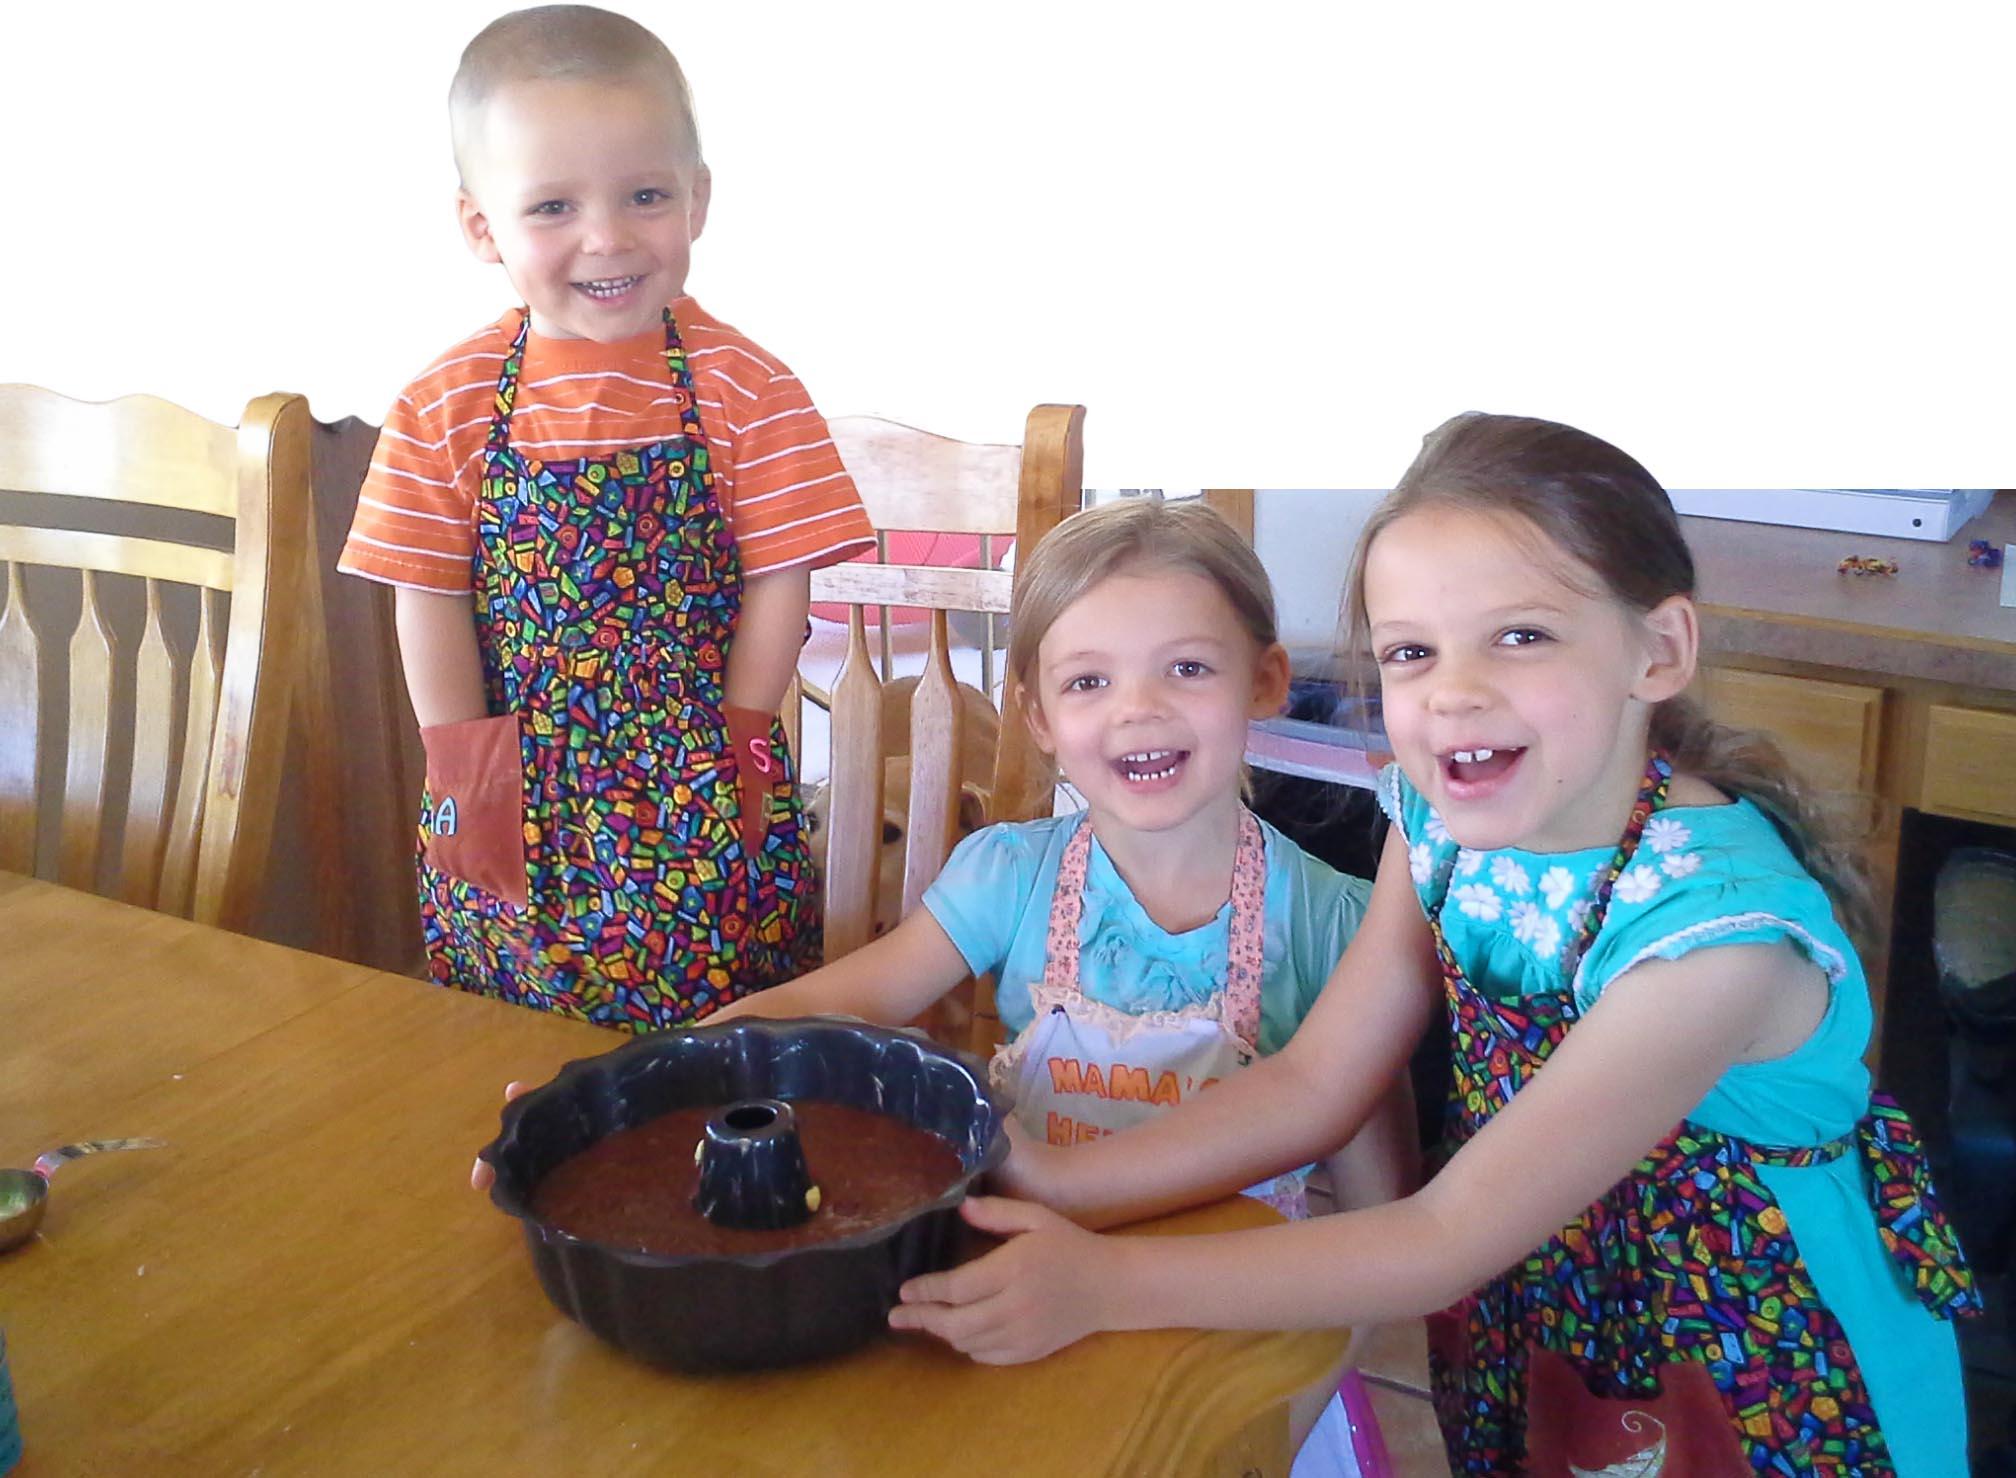 No Regrets: Homeschooling for Medical Reasons - Juanita Pfaff